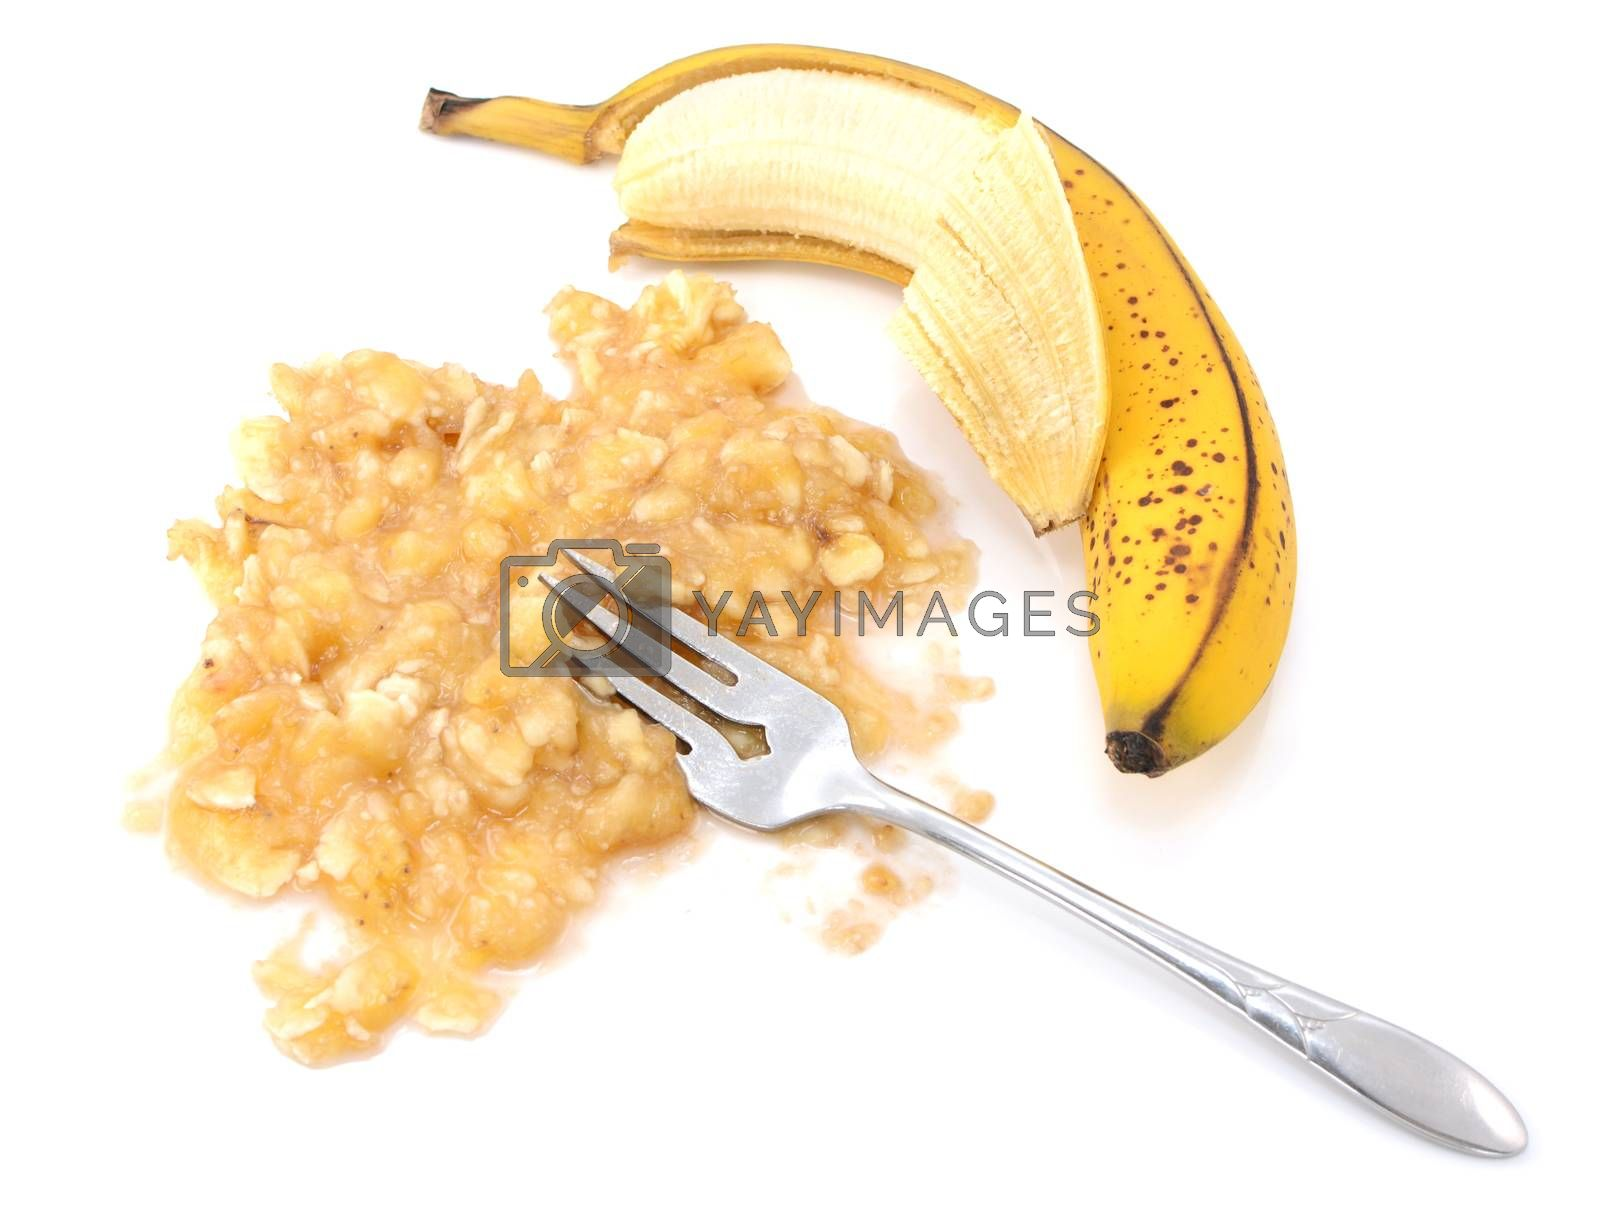 Half-peeled ripe banana with mashed fruit by sarahdoow